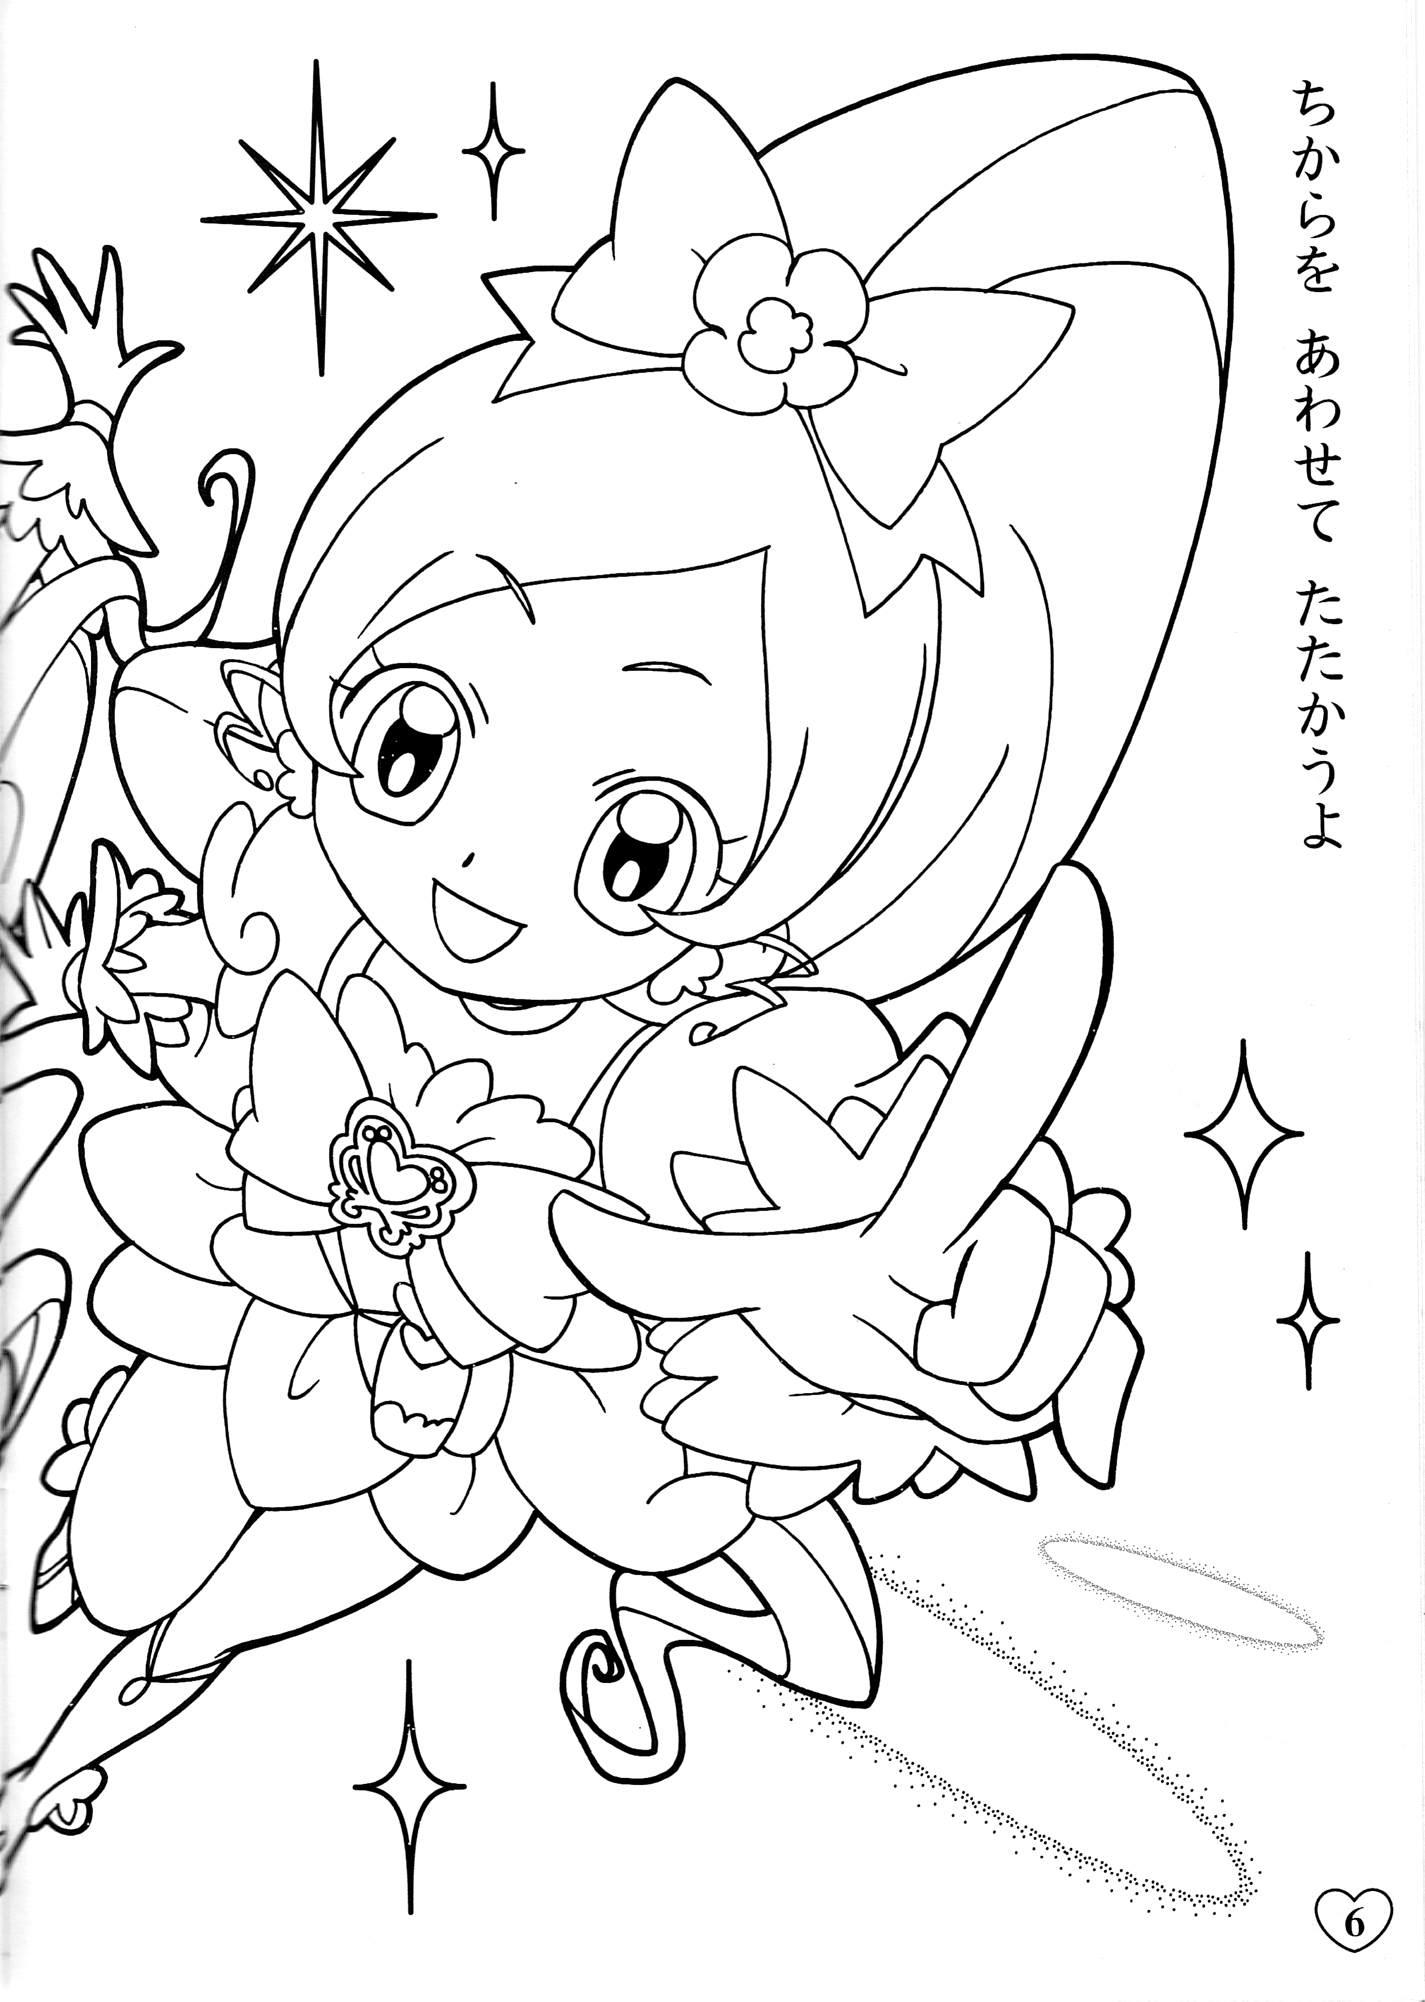 Num Noms Kleurplaat Heartcatch Precure Coloring Page Zerochan Anime Image